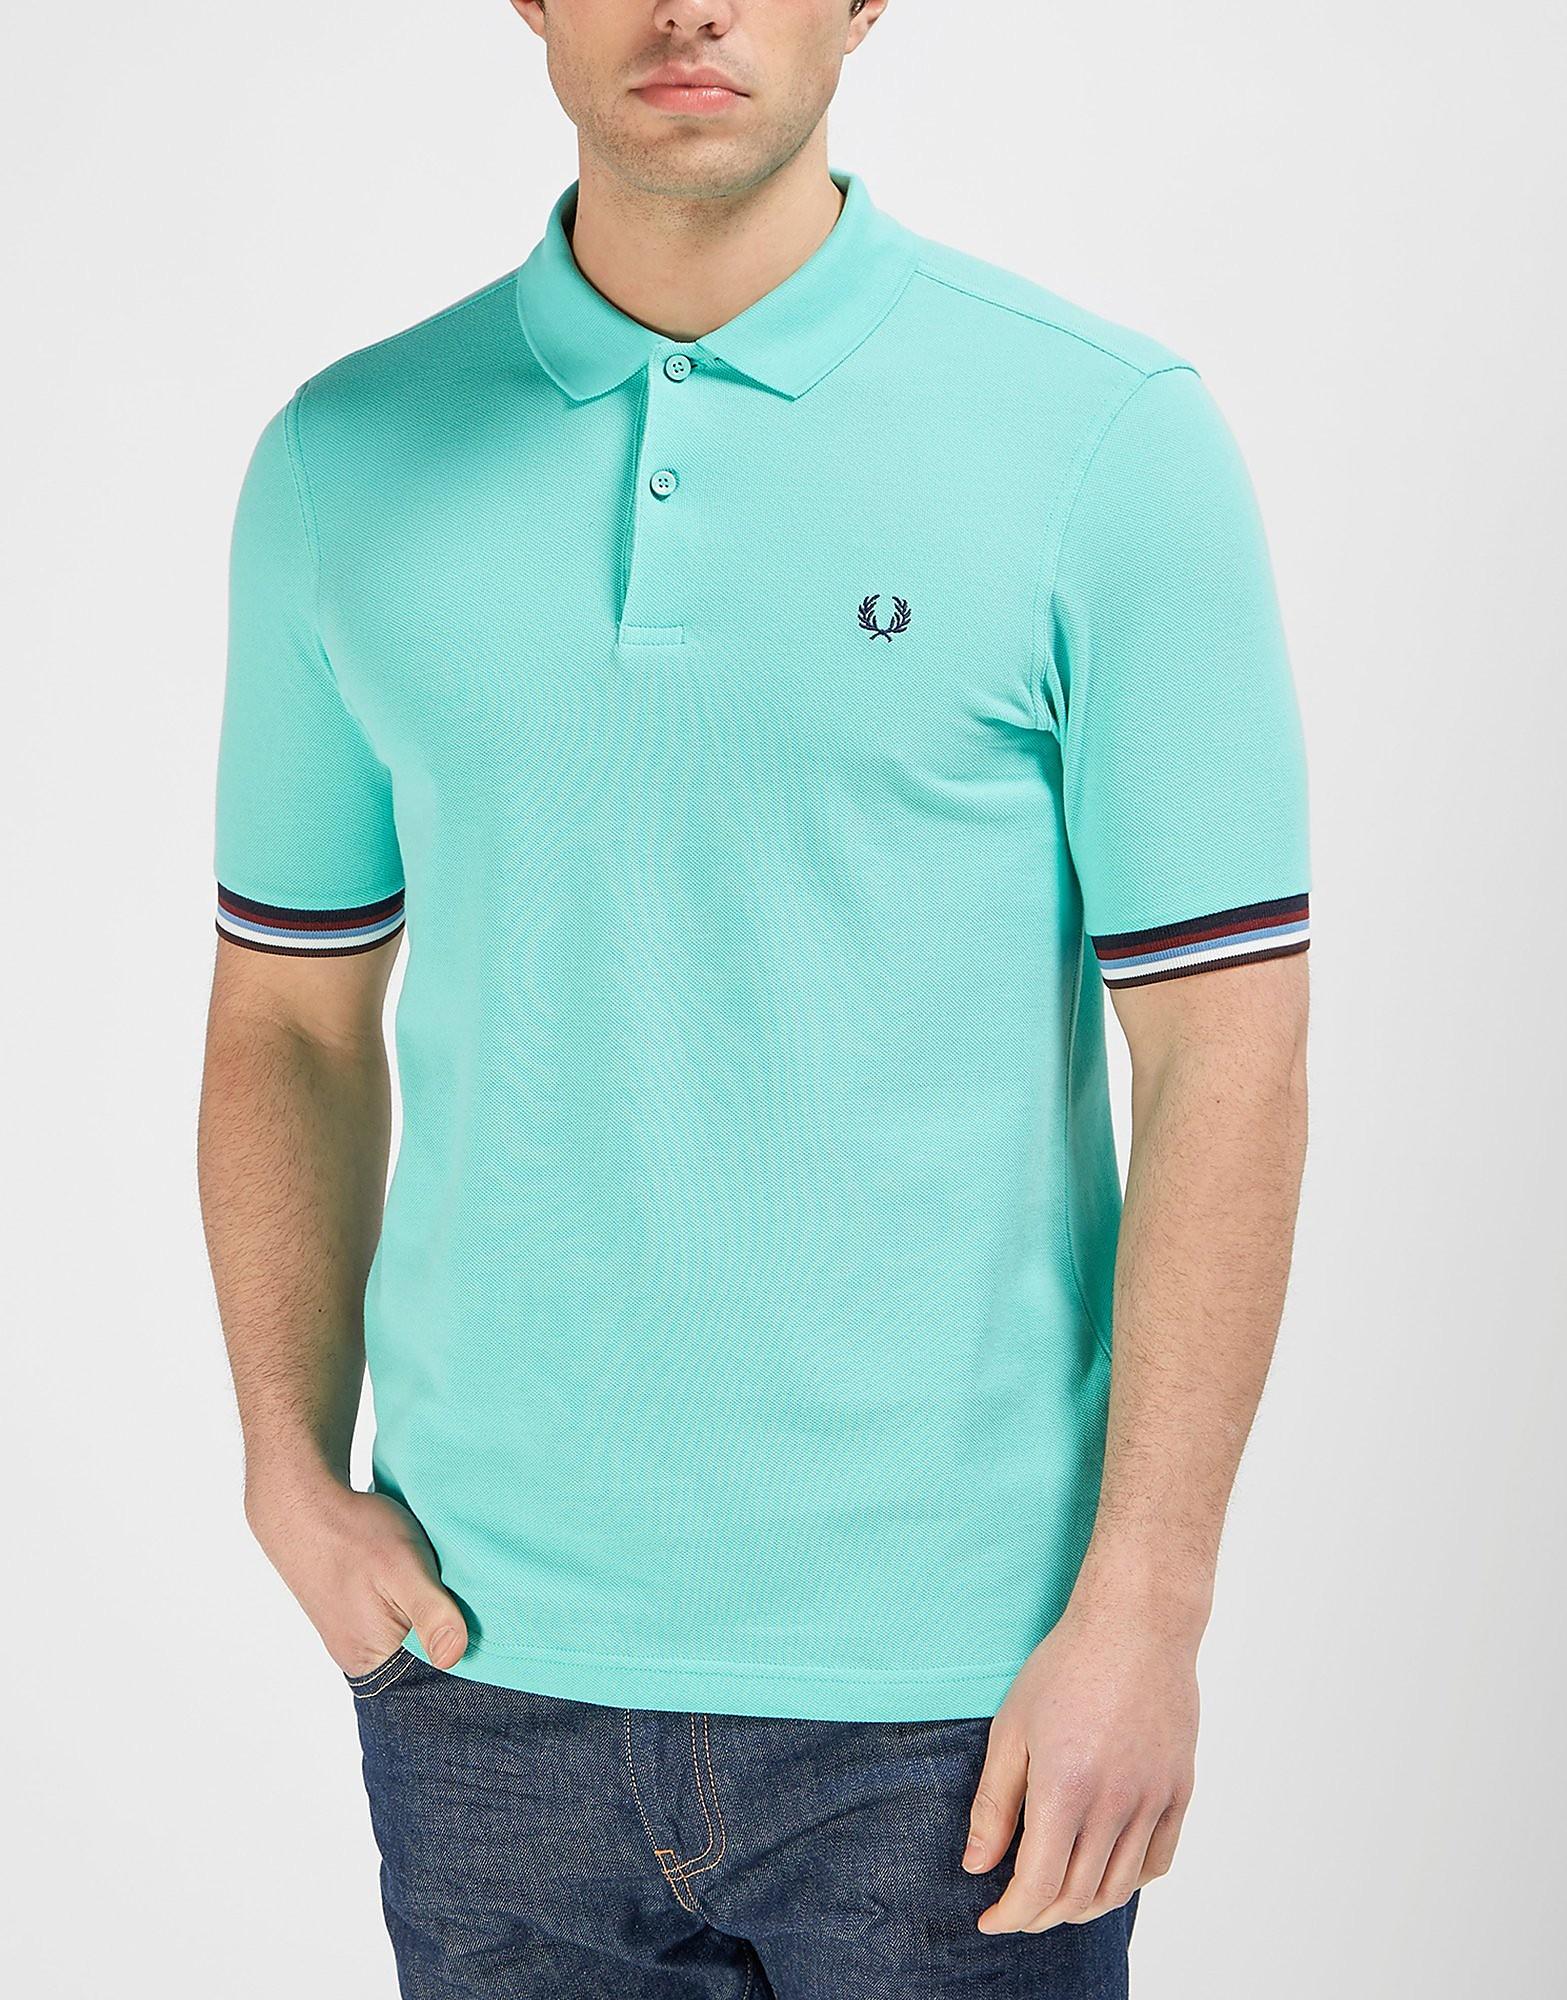 Fred Perry Bradley Wiggins Stripe Cuff Polo Shirt  Green Green